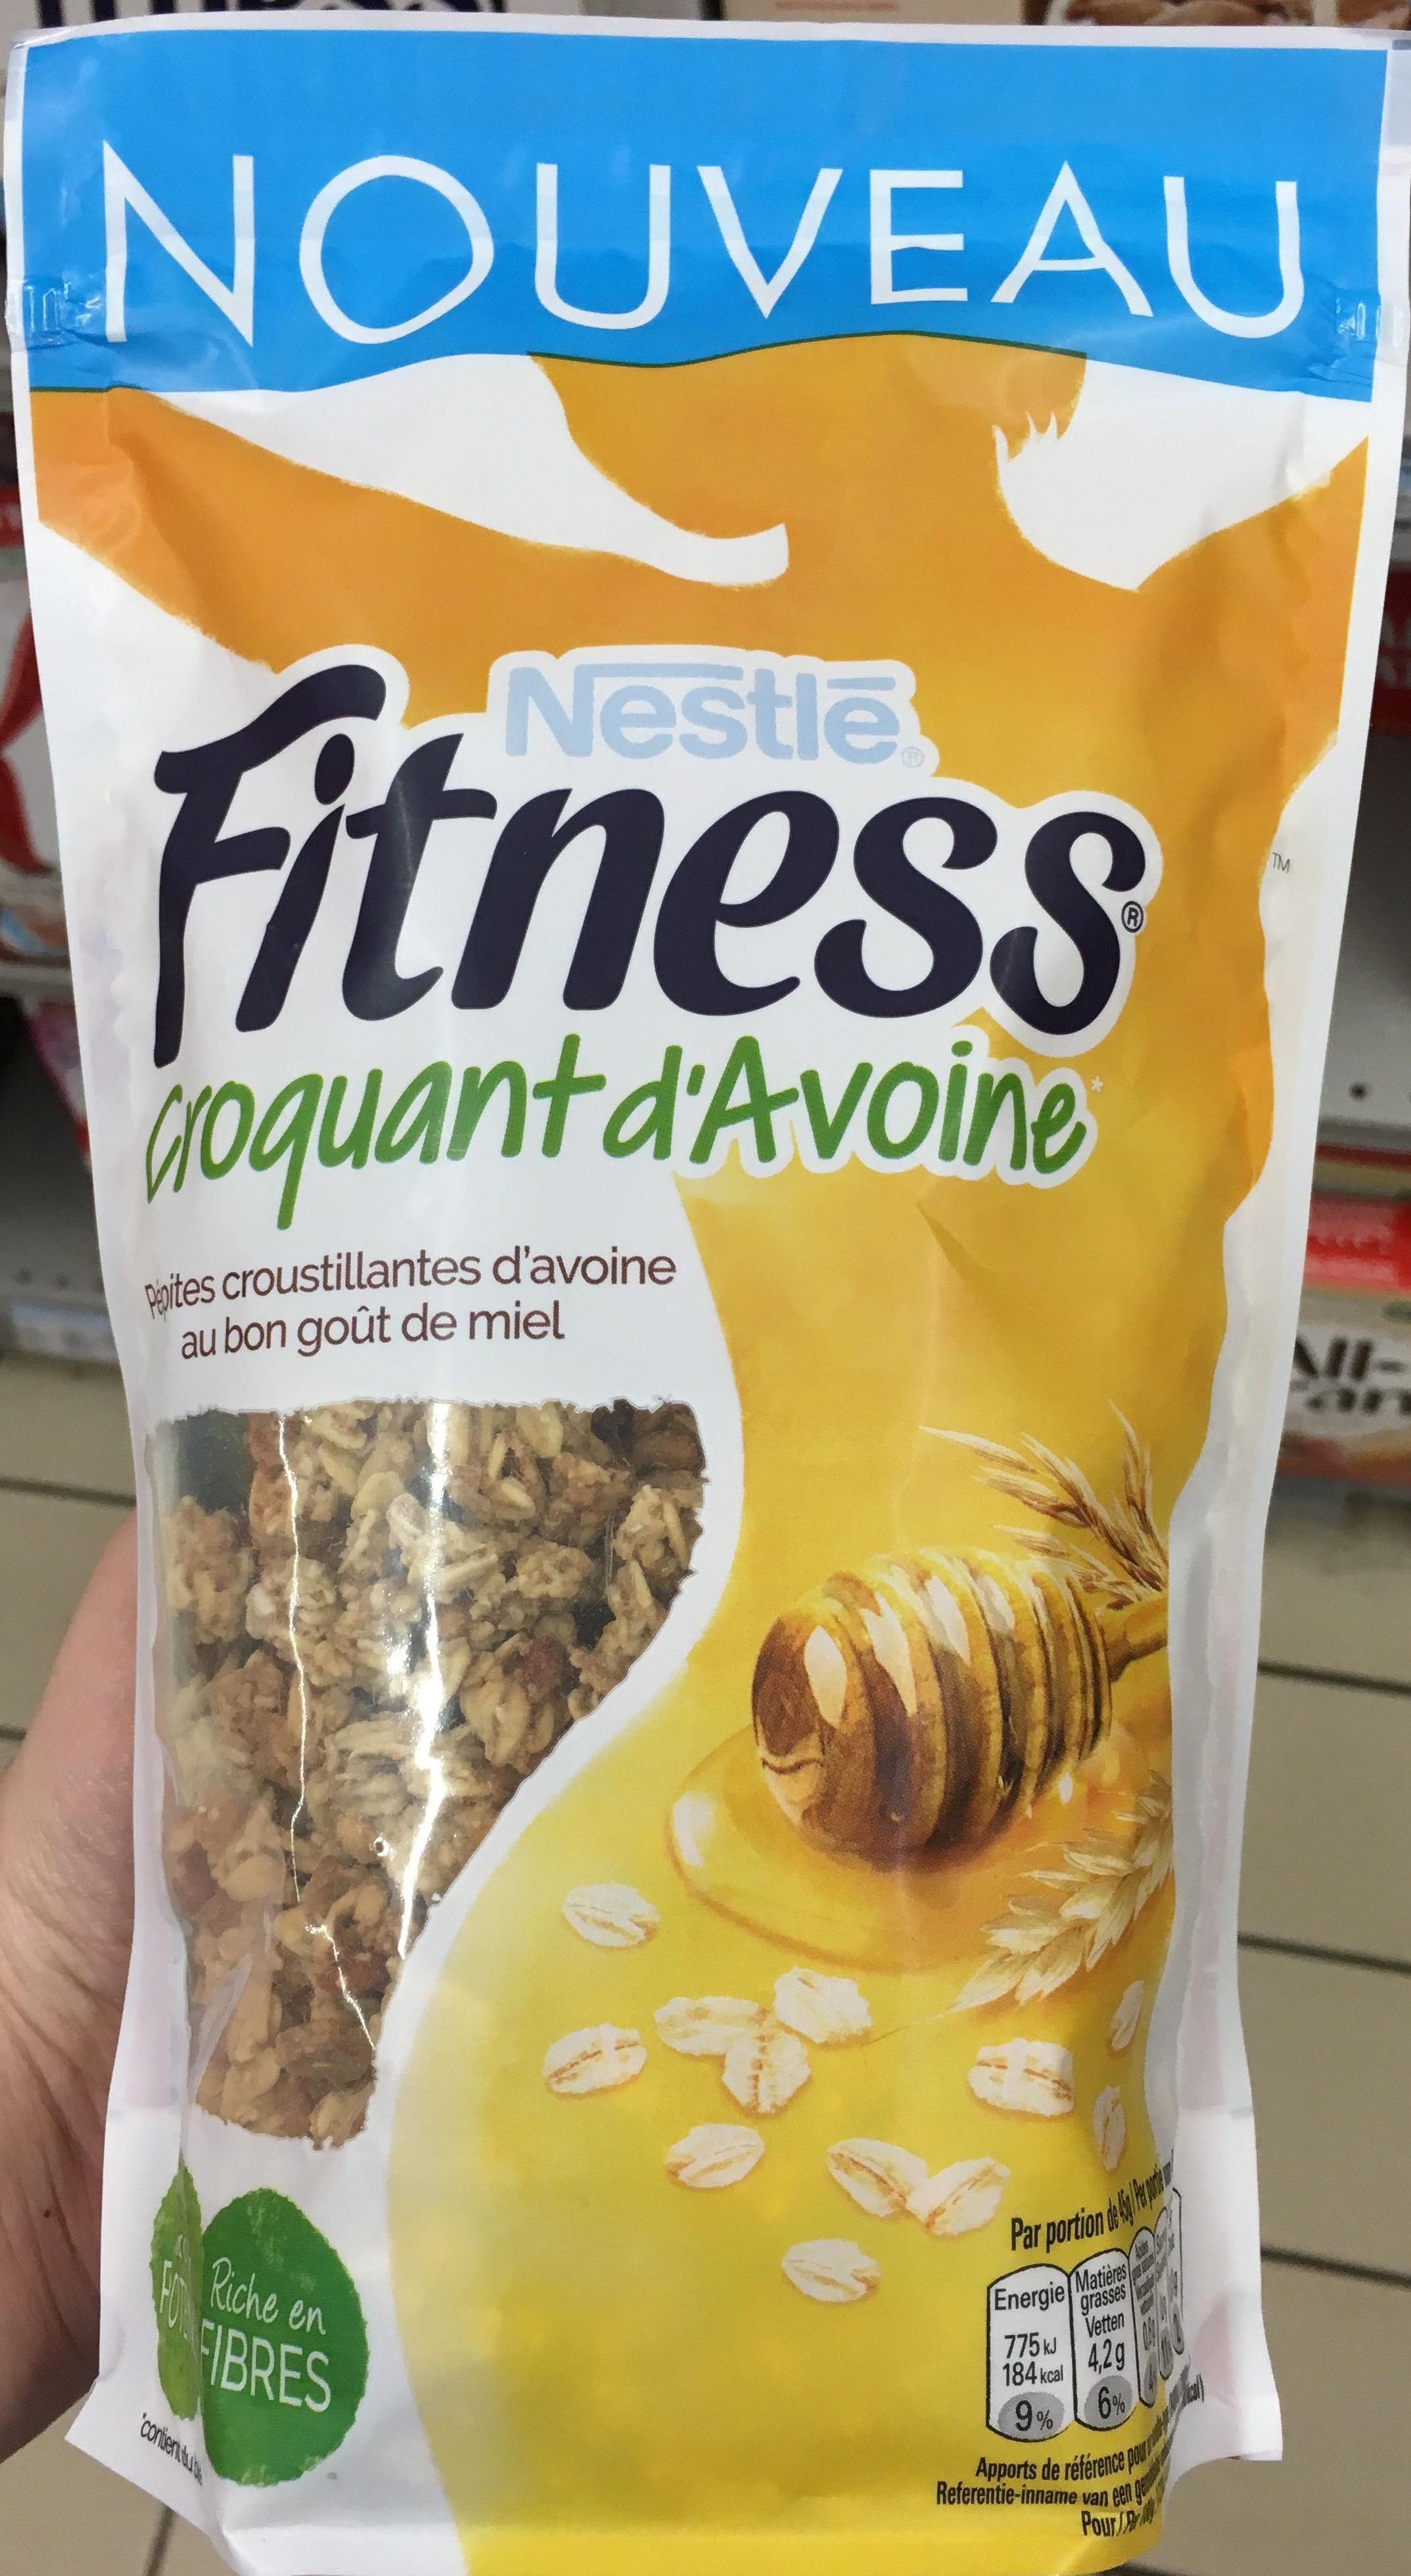 Fitness croquant d'avoine - Product